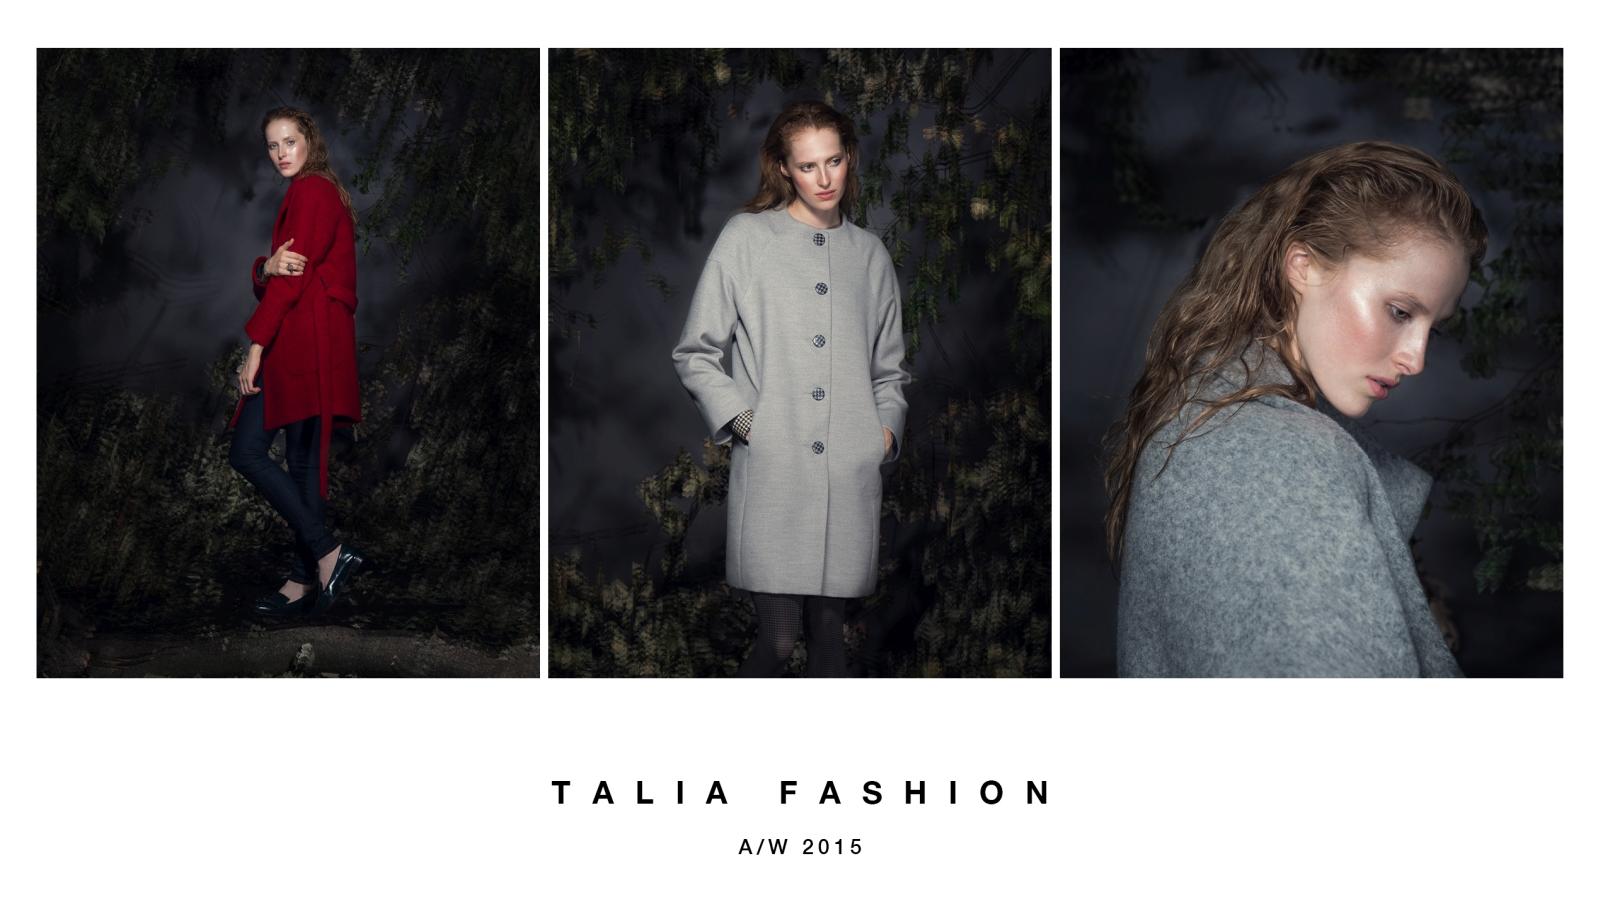 talia campaign 2